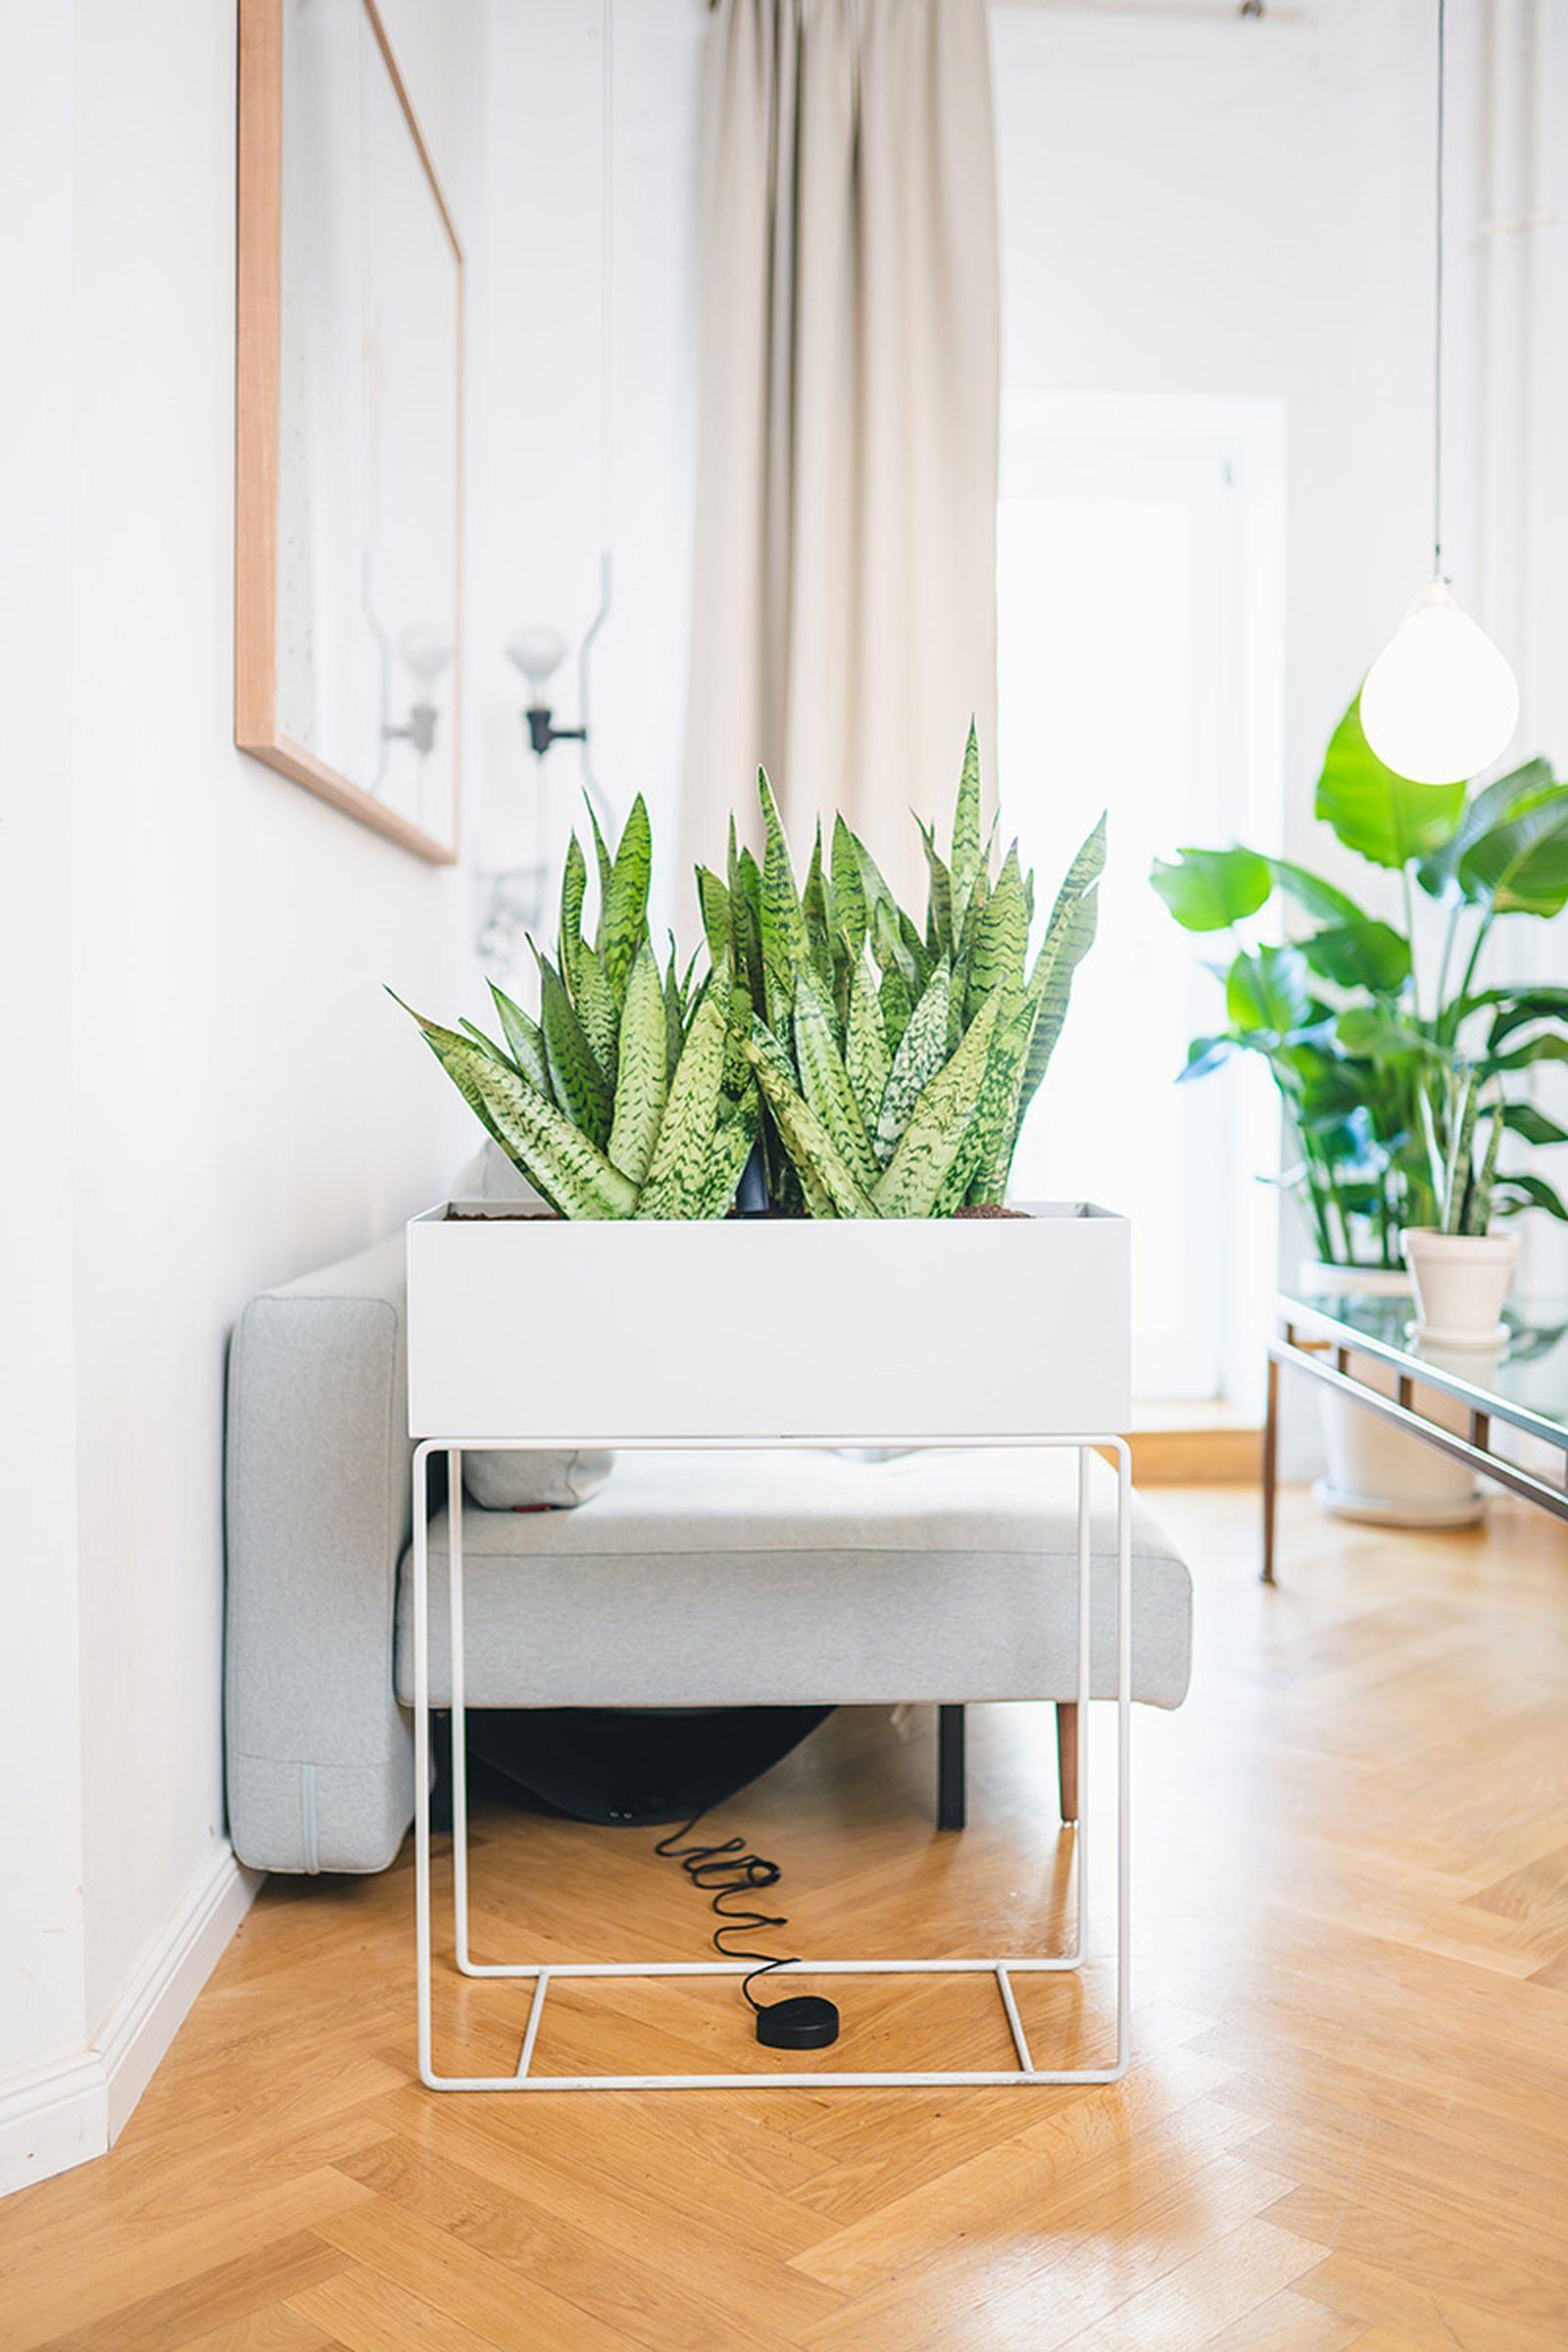 easy-house-plants-for-beginners-11